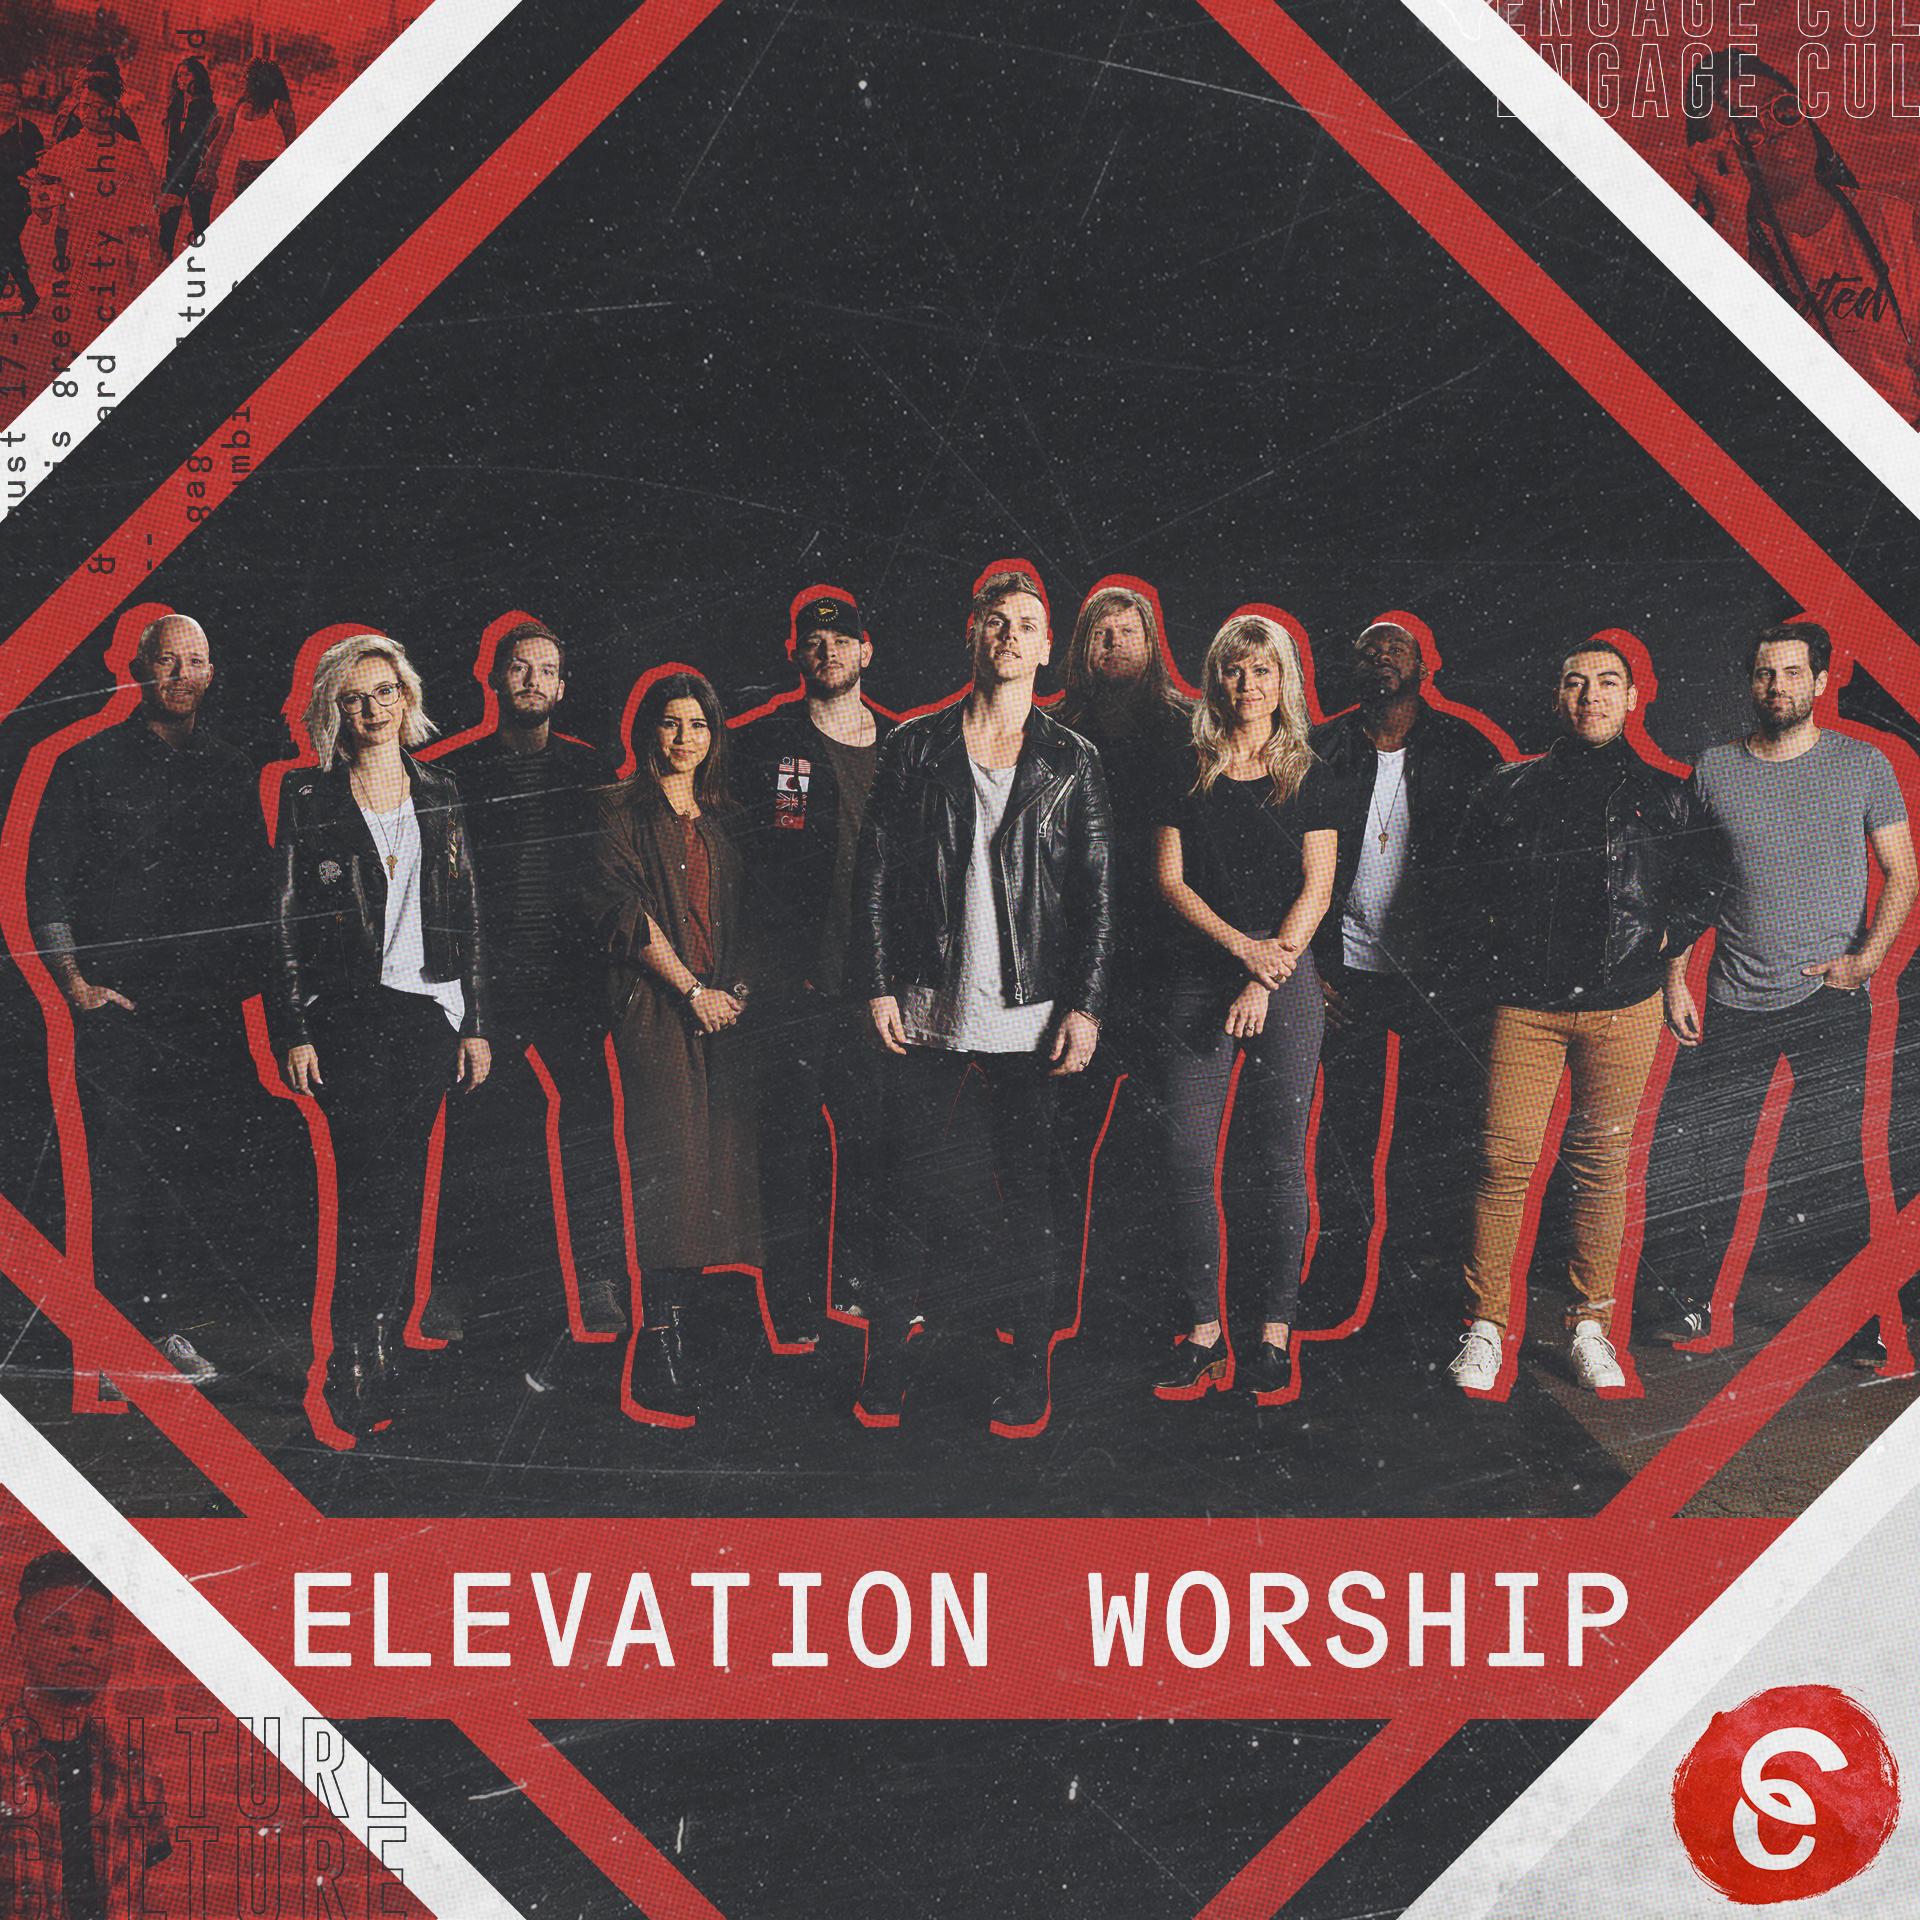 EC_1920x1920_Elevation-Worship.jpg